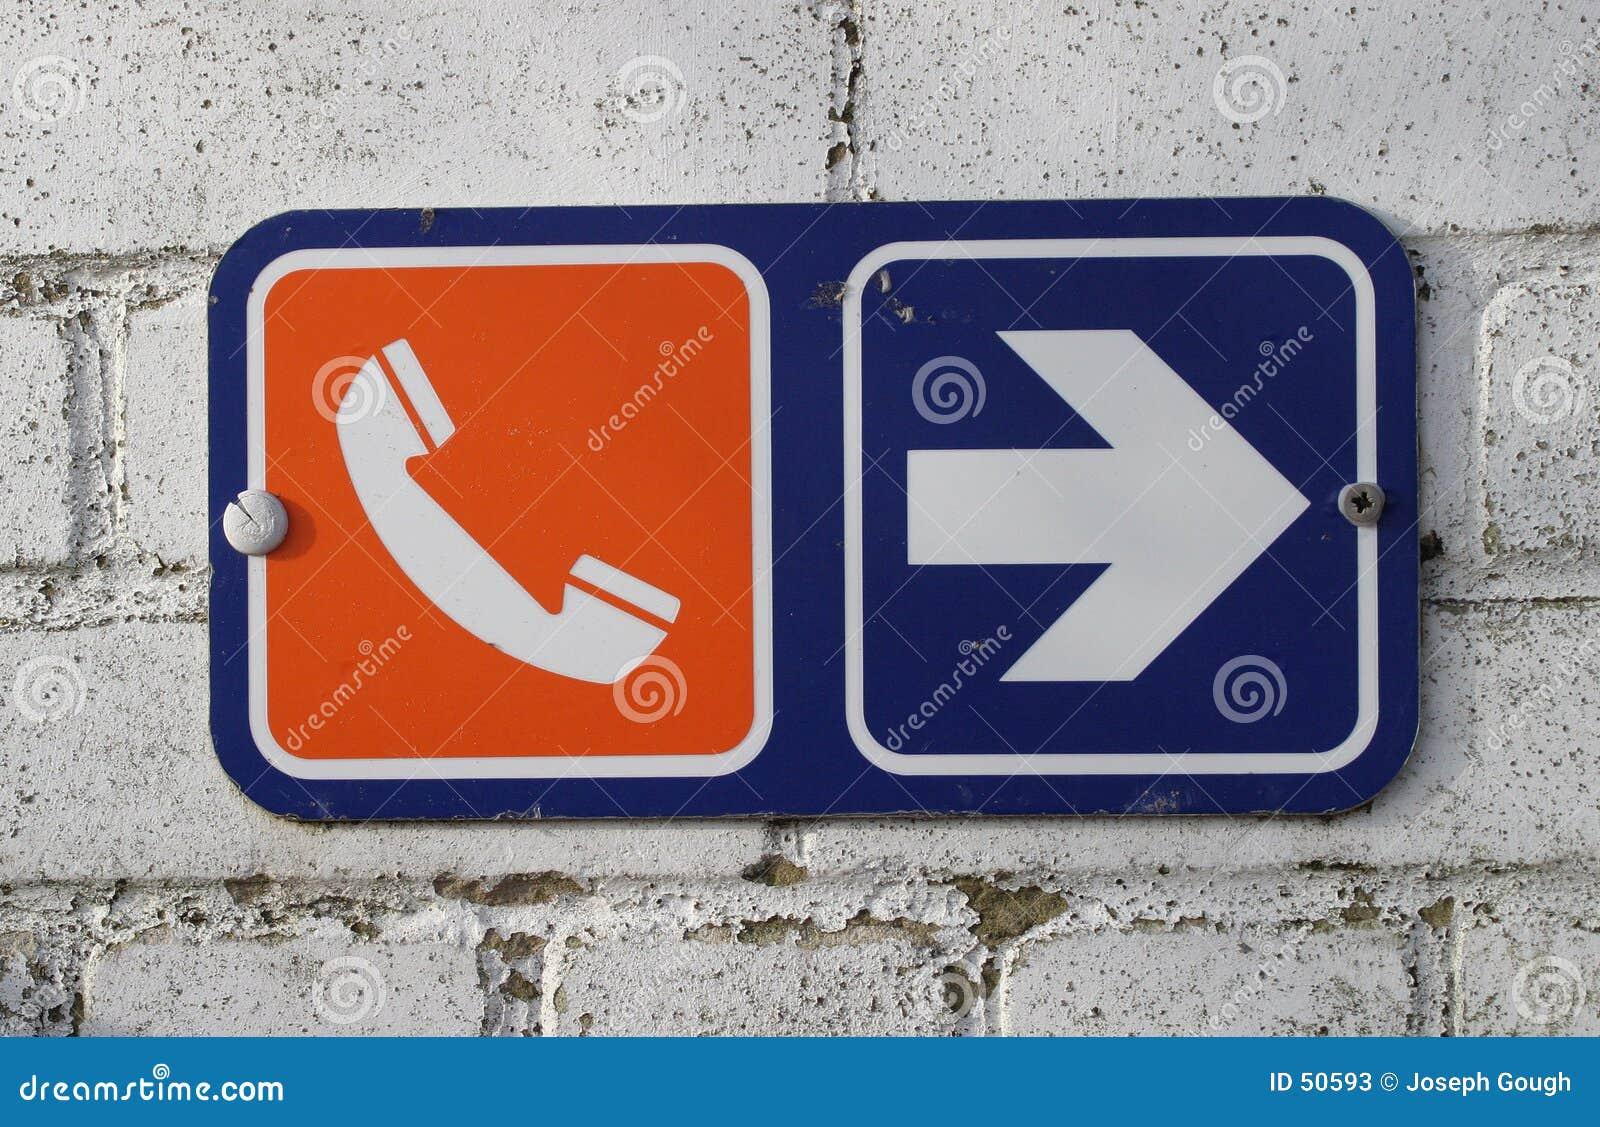 Download τηλέφωνο σημαδιών στοκ εικόνα. εικόνα από κατεύθυνση, σύμβολο - 50593